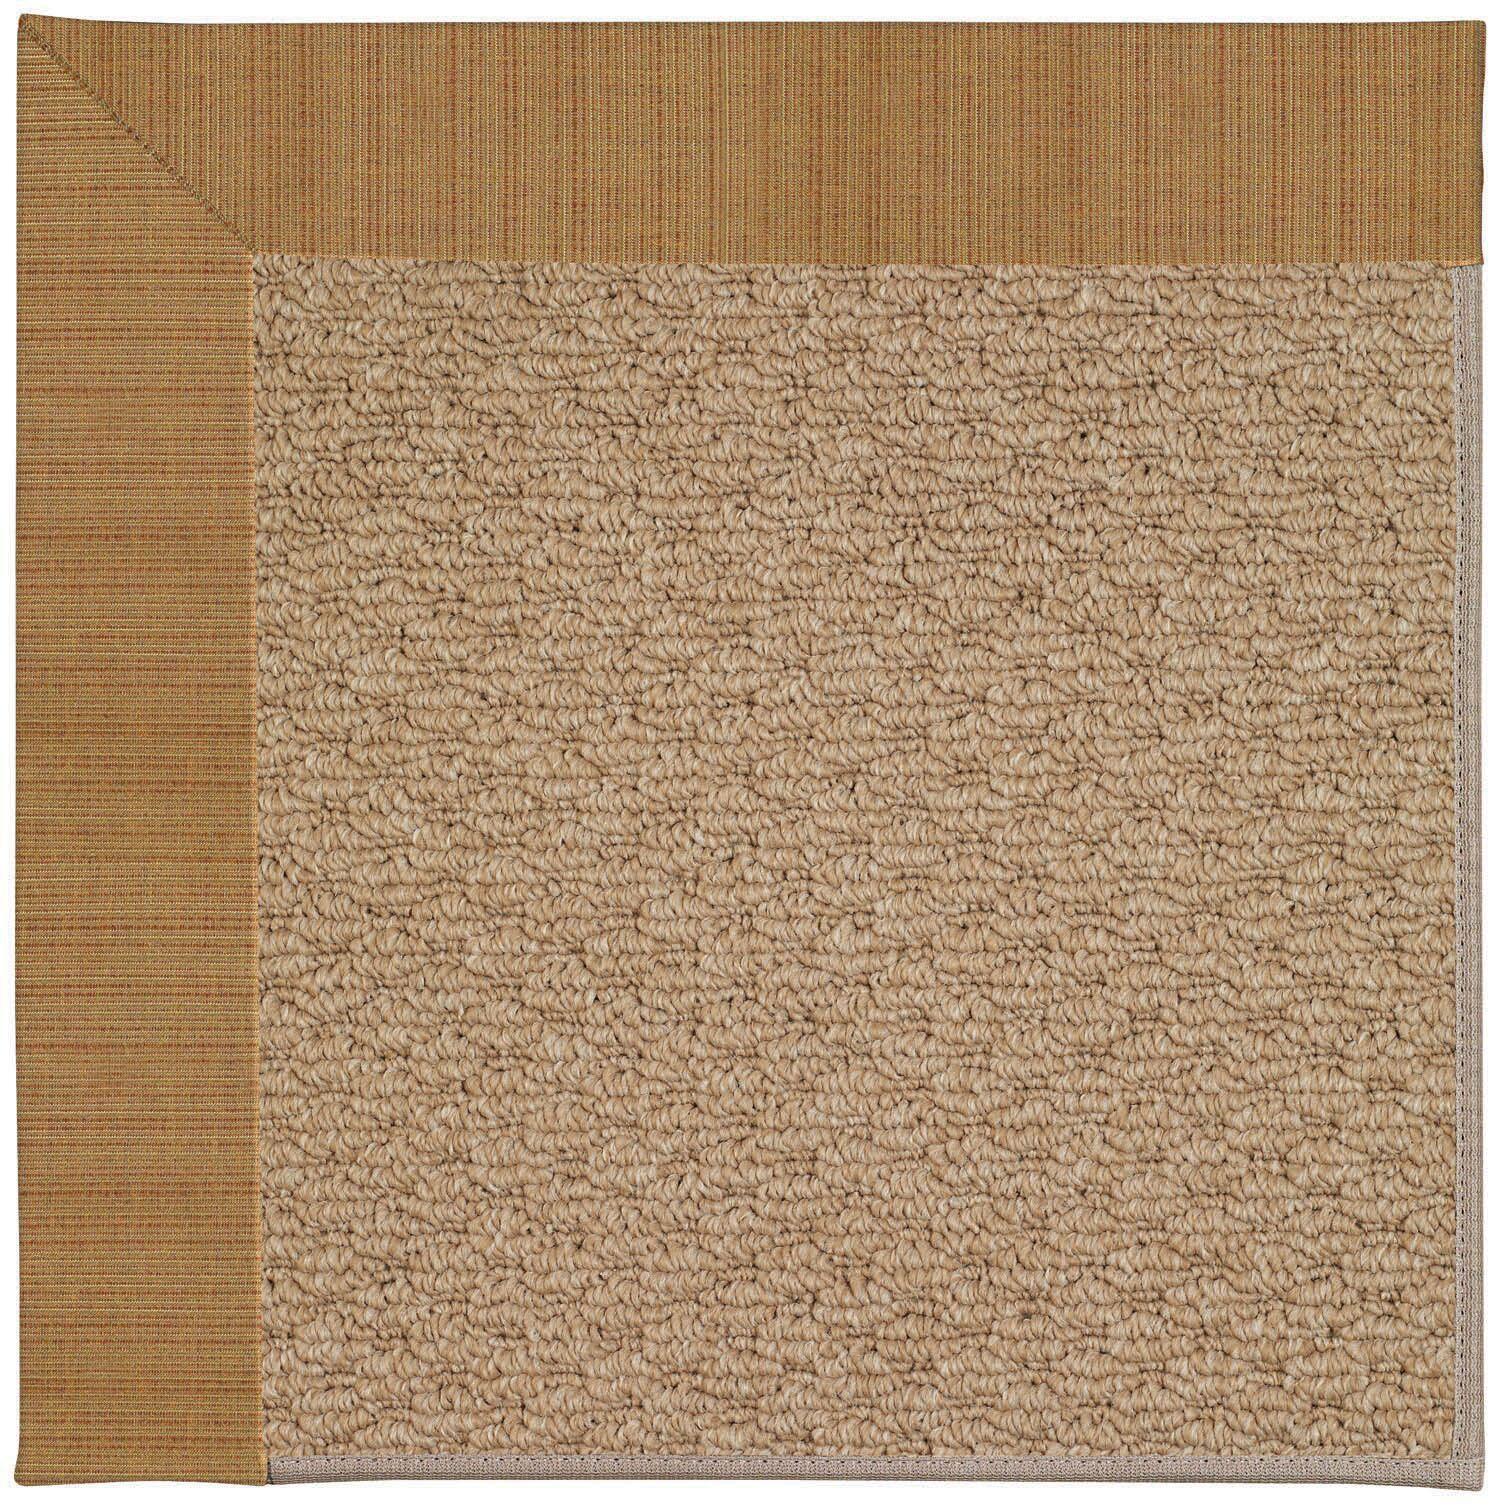 Lisle Machine Tufted Golden Indoor/Outdoor Area Rug Rug Size: Rectangle 5' x 8'